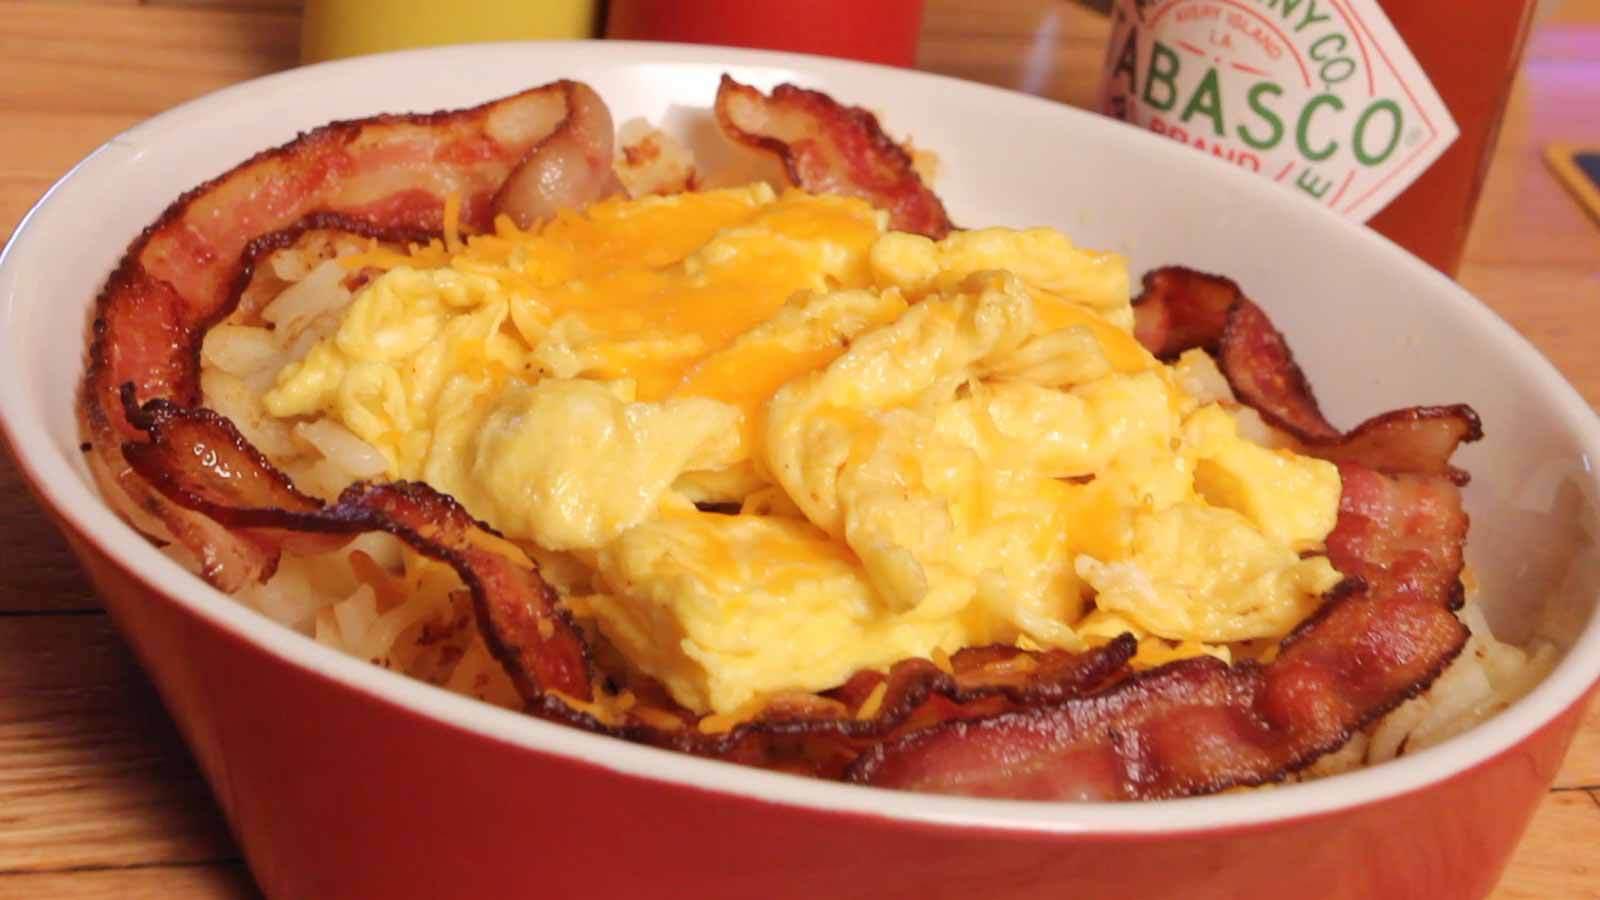 Krazy K's Breakfast